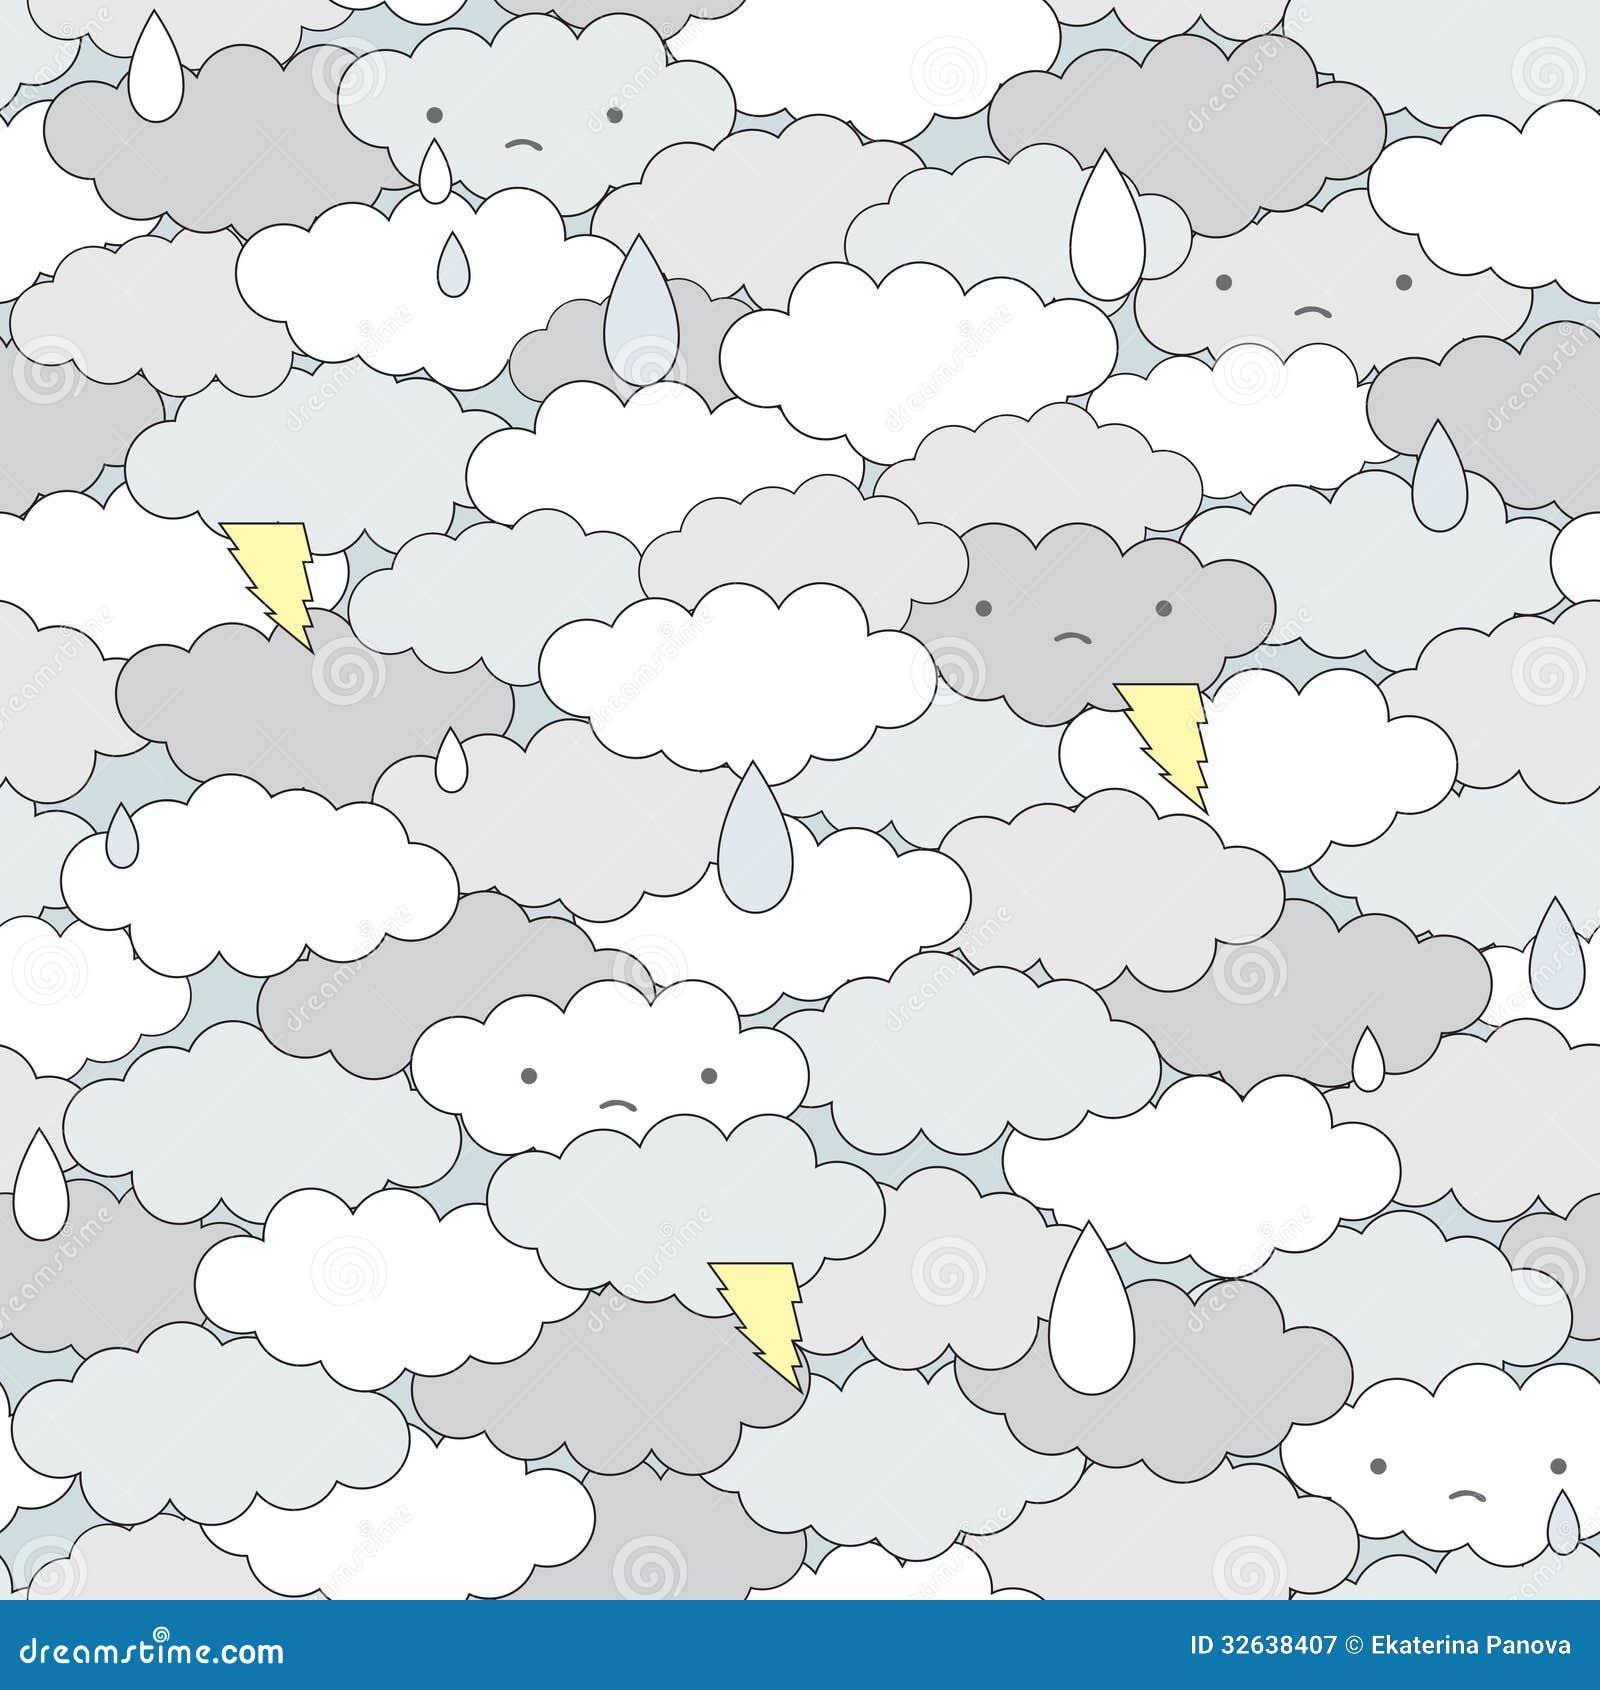 Baju kahwin muslimah www imgarcade com online image arcade - Seamless Cloud Pattern Galleryhip Com The Hippest Wallpaper Gallery Light Rain Rain Cloud